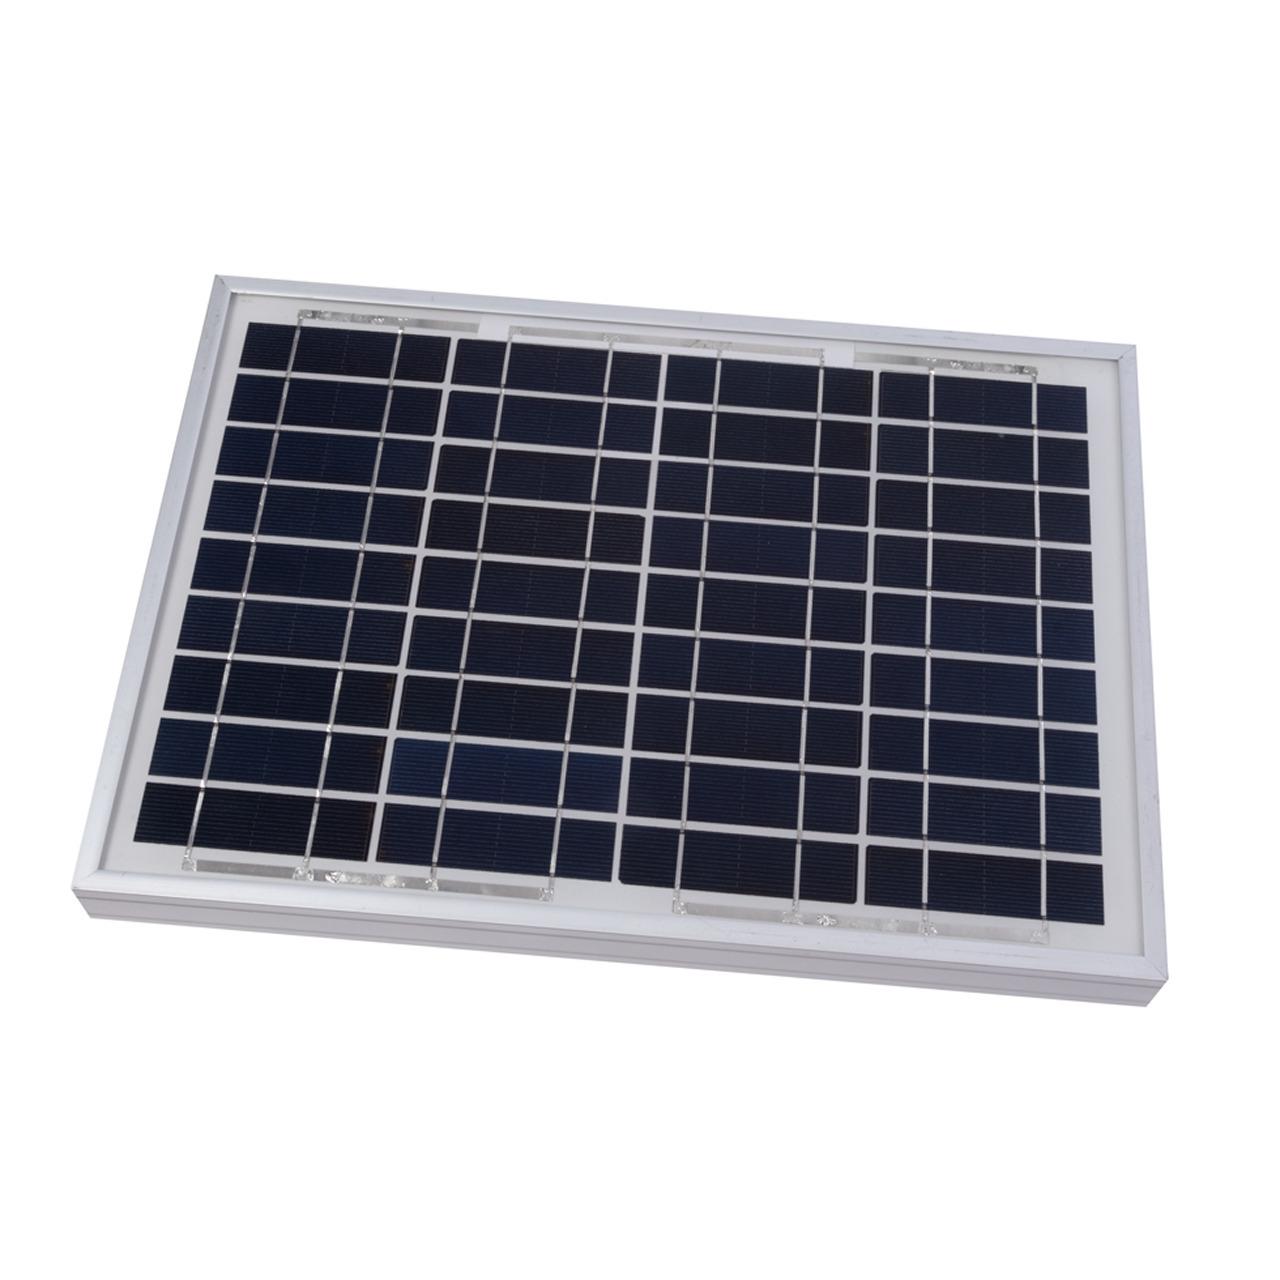 Velleman Polykristallines Solarmodul SOL10P- 12 V- 10 W